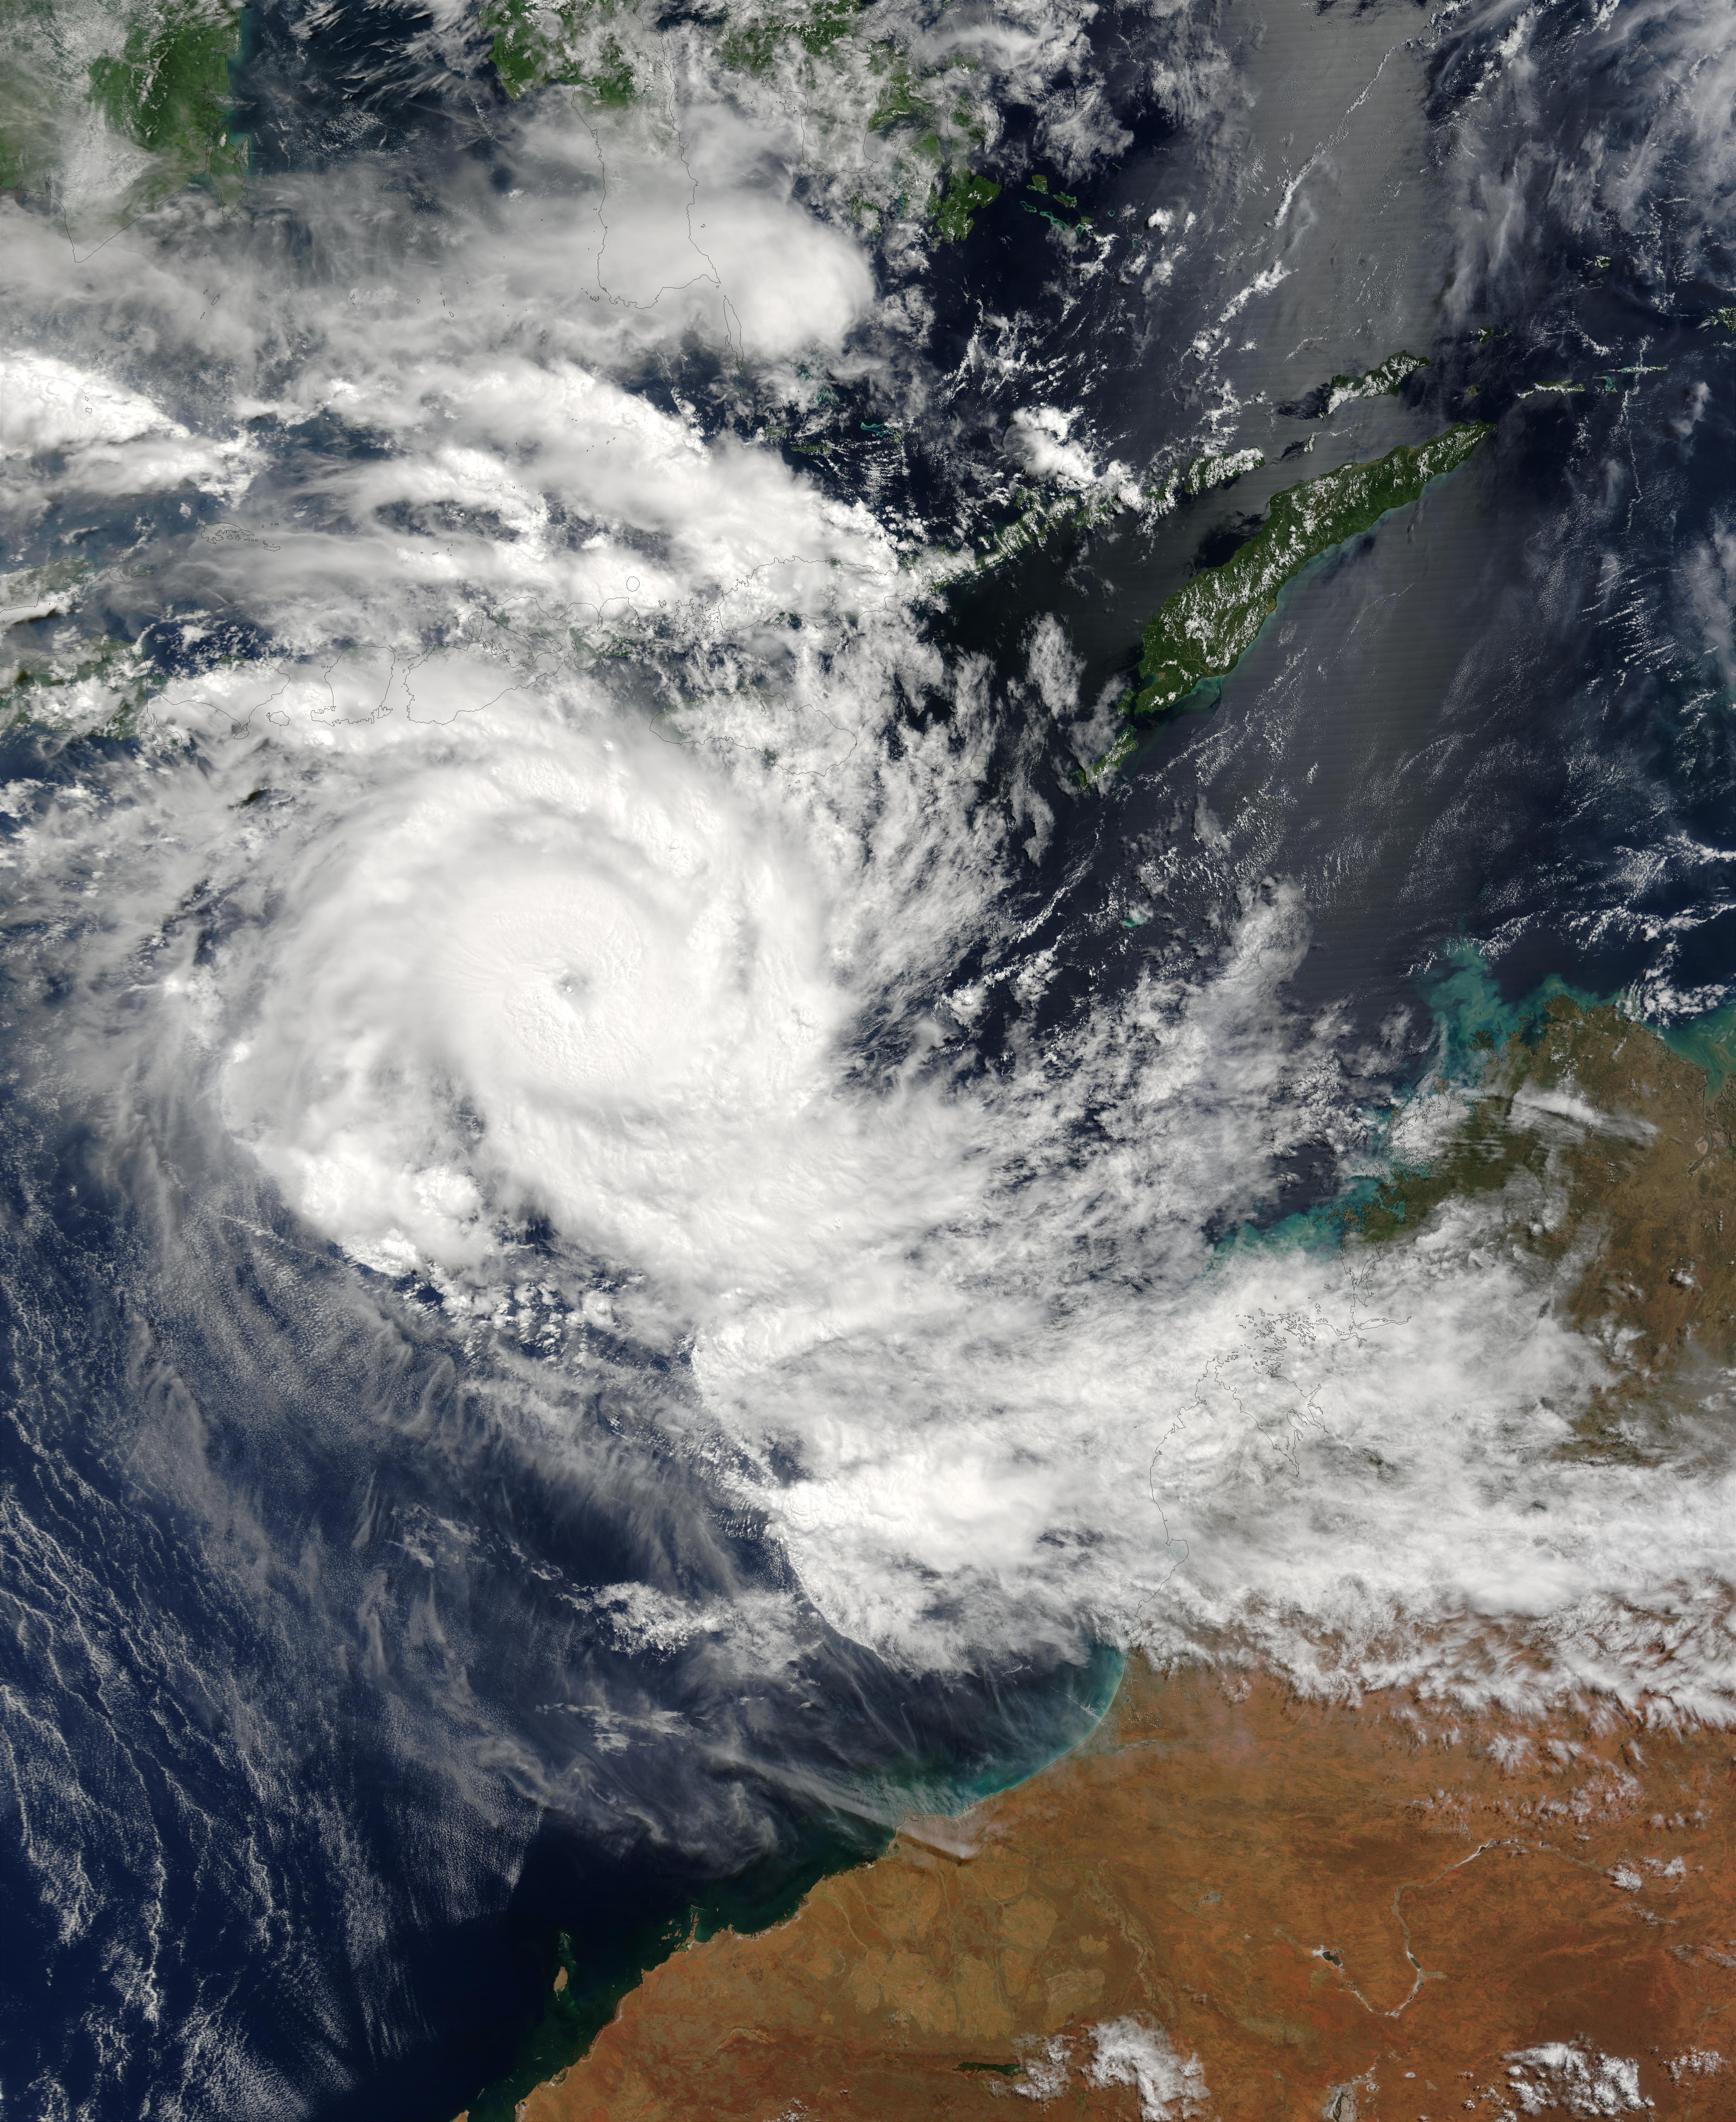 Tropical Cyclone Inigo (26S) approaching northwest Australia